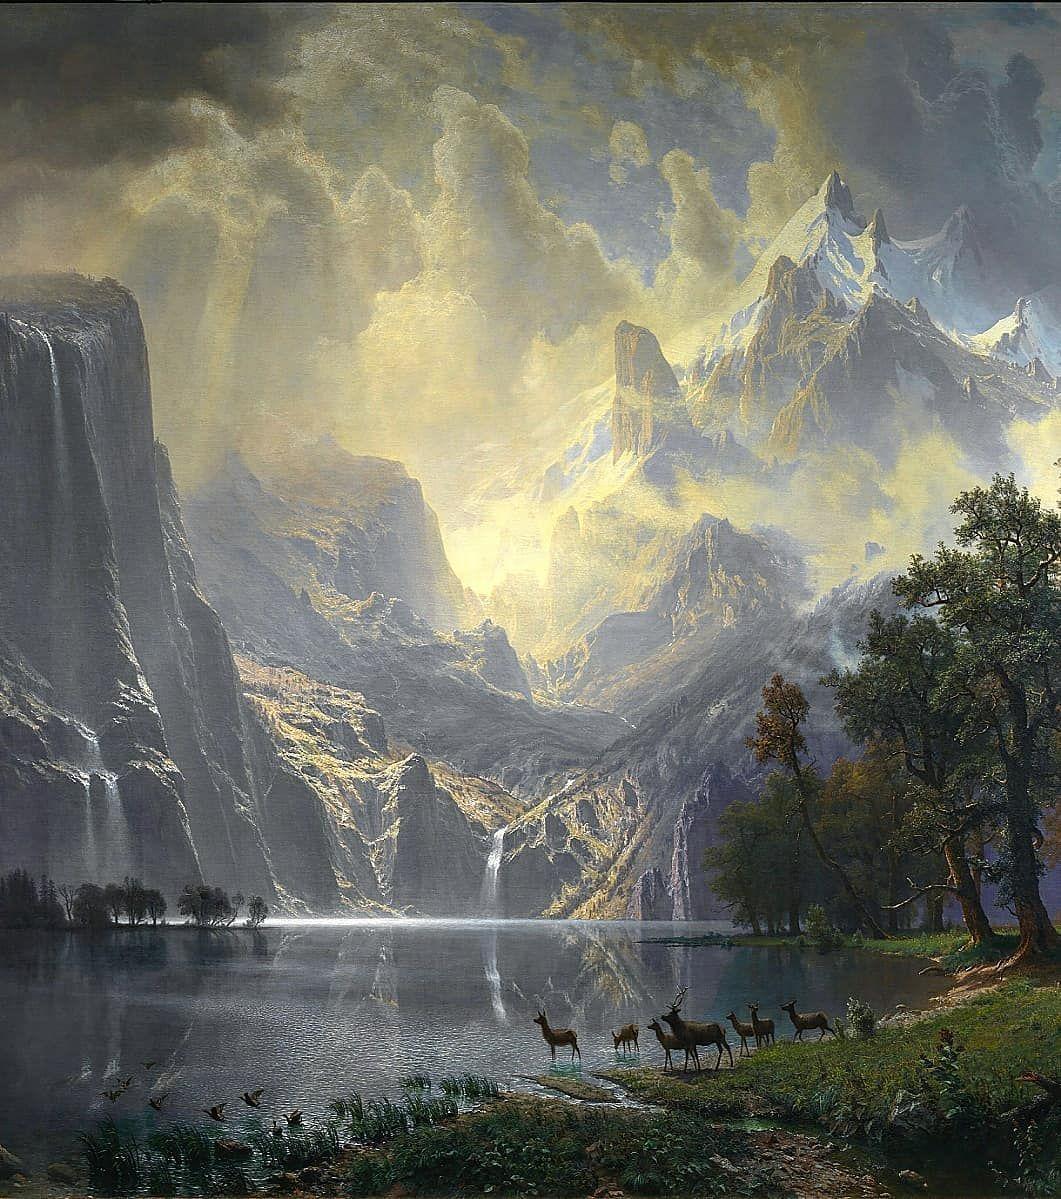 Albert Bierstadt 1830 1902 Fantasy Landscape Albert Bierstadt Paintings Mountain Paintings Fantasy art river forest mountains sky